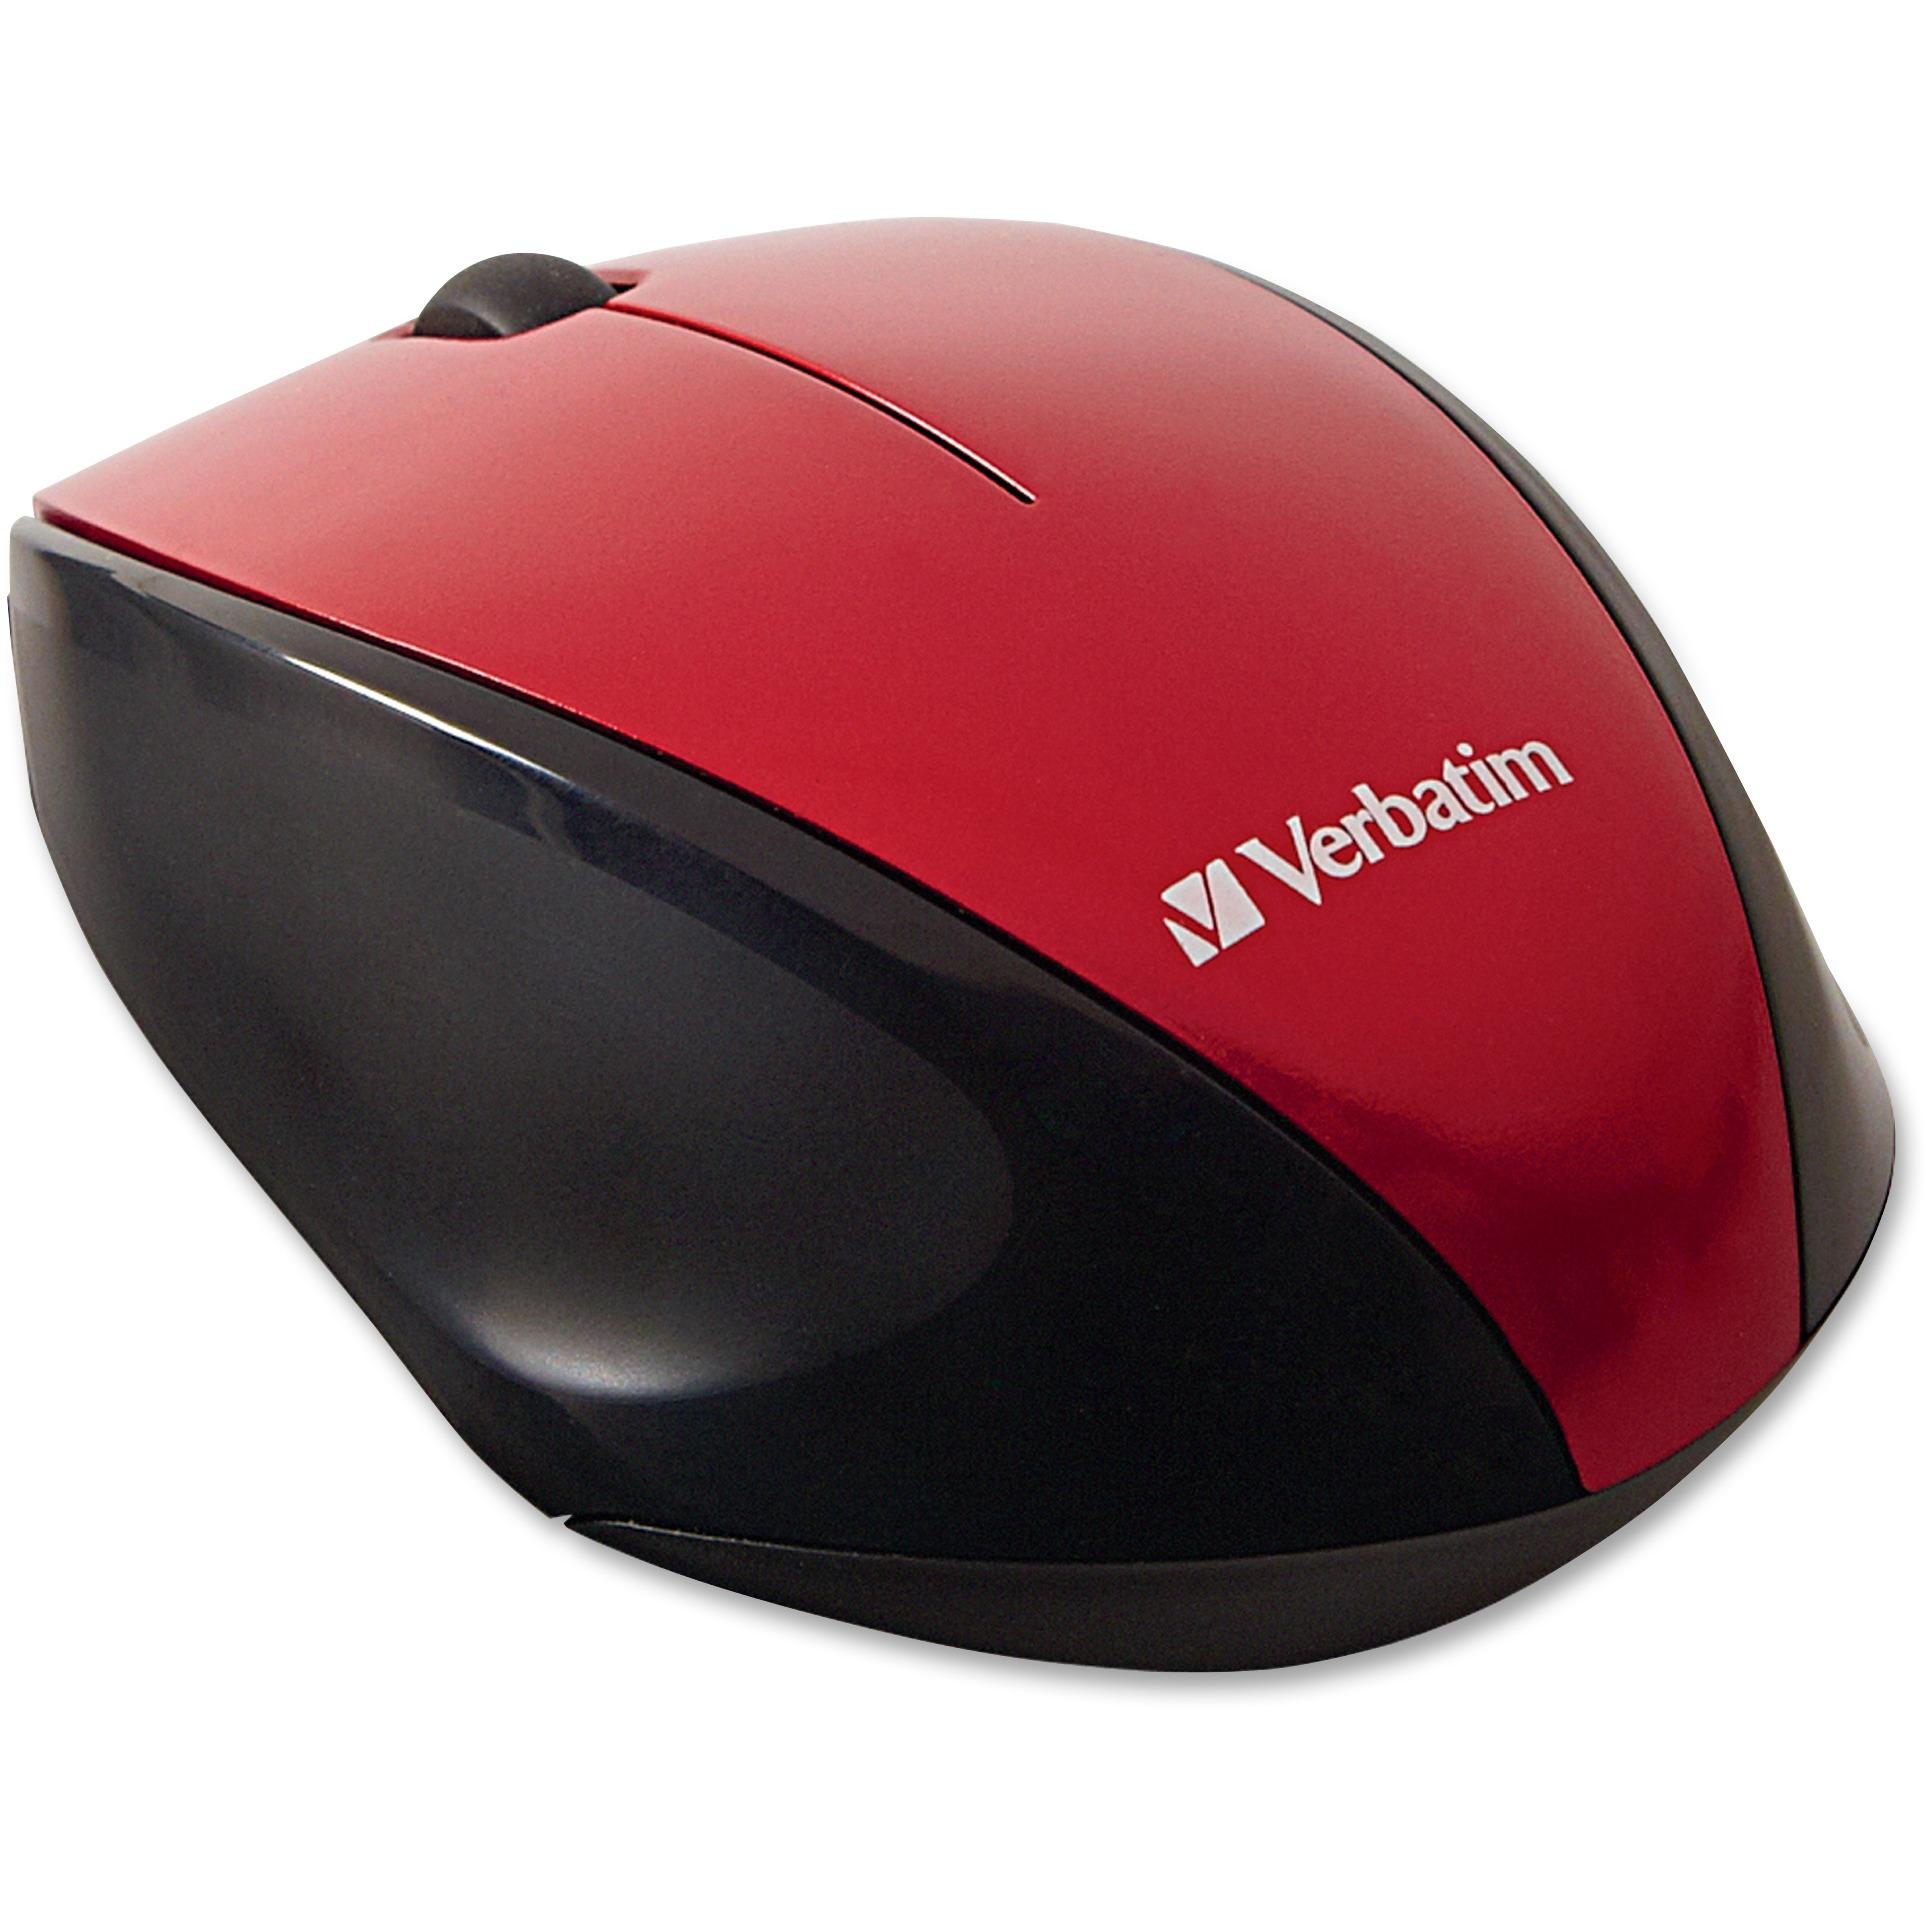 Verbatim, VER97992, Wireless Multi-trac LED Optical Mouse, 1, Black